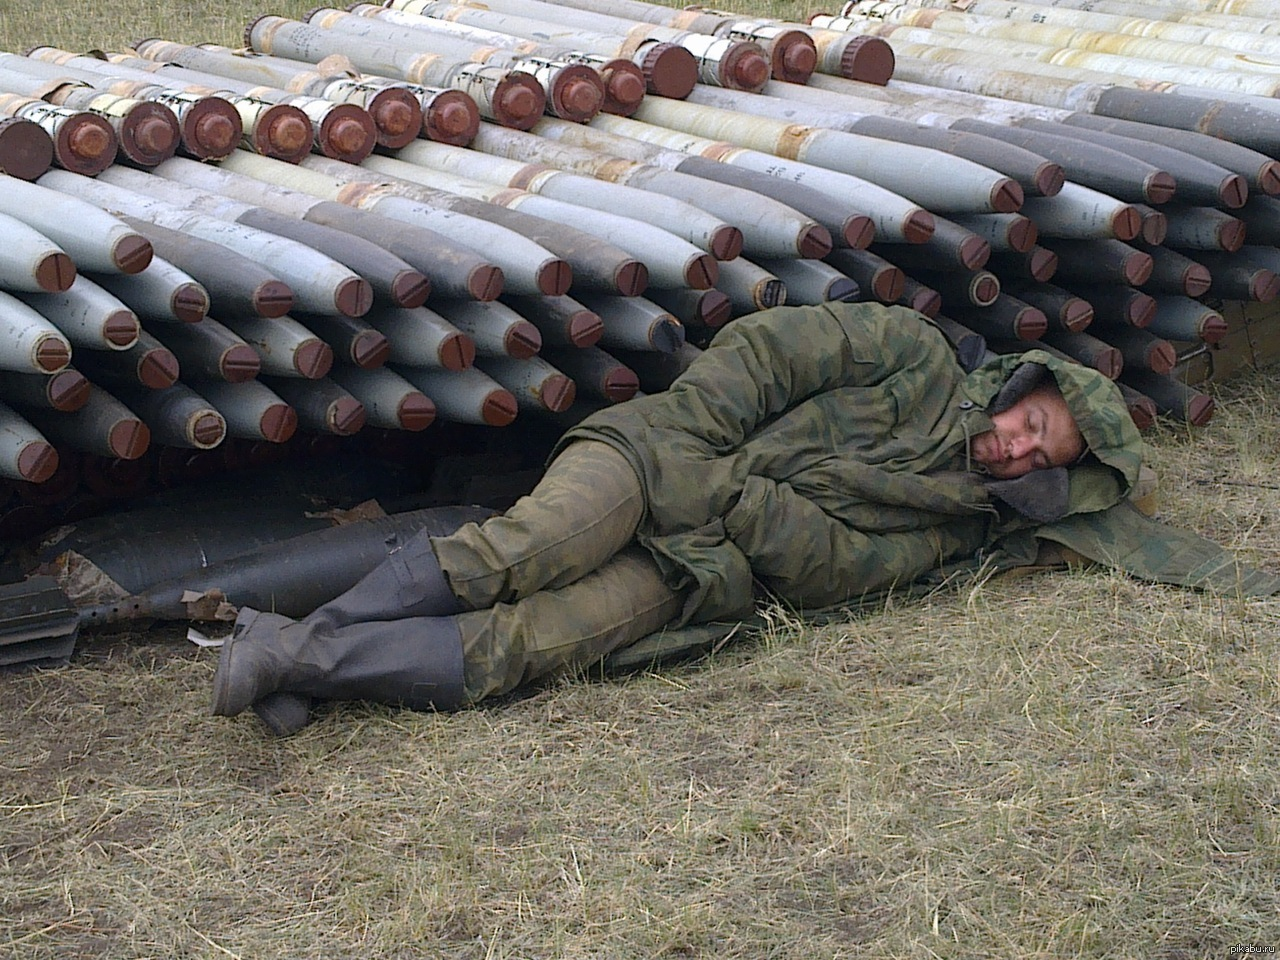 солдат спит служба идет фото